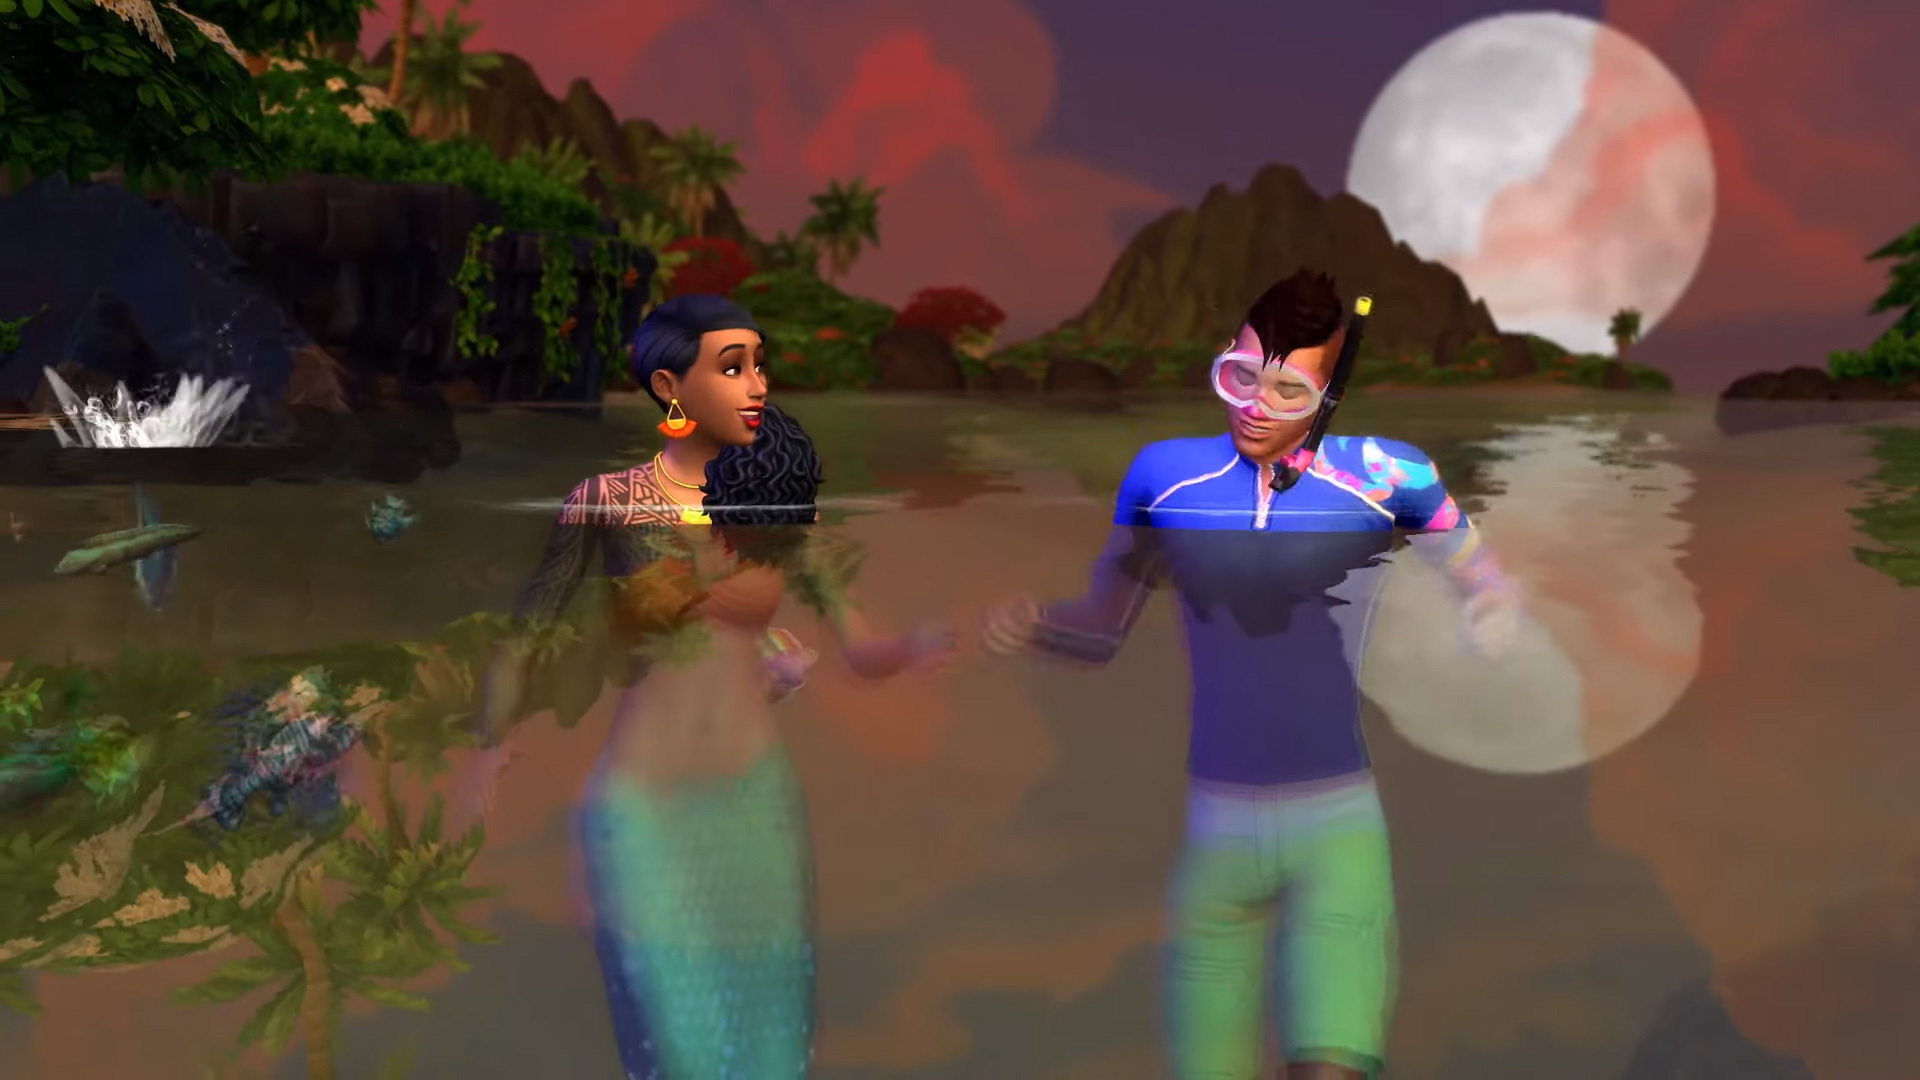 Secrets and Hidden Mechanics in the Sims 4